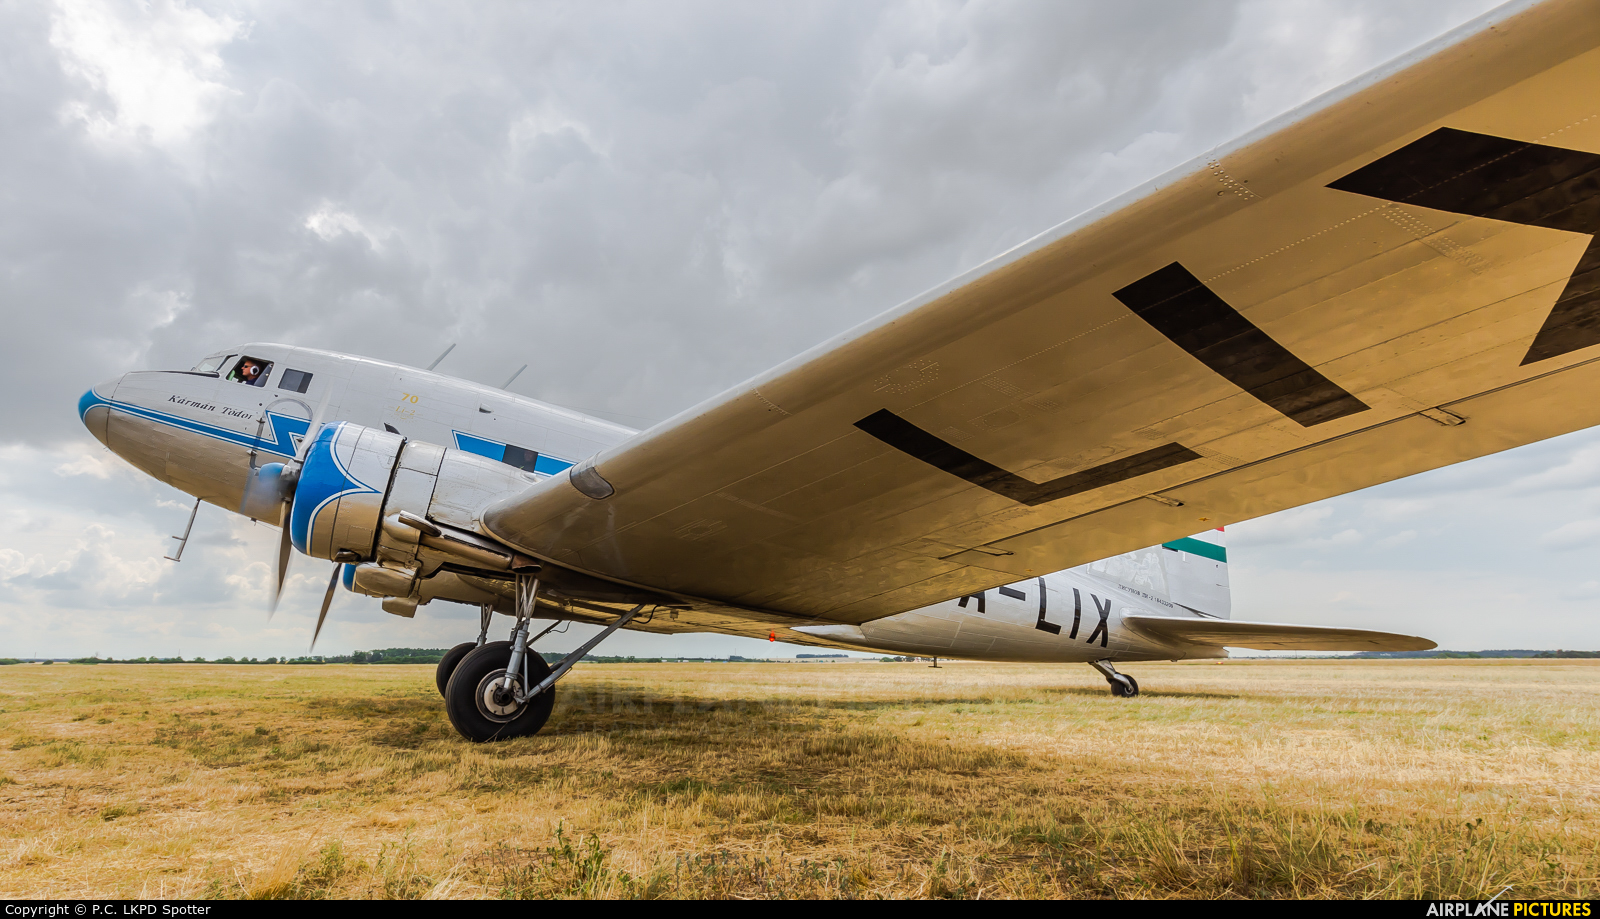 Malev Sunflower Aviation (Gold Ttimer Foundation) HA-LIX aircraft at Roudnice nad Labem